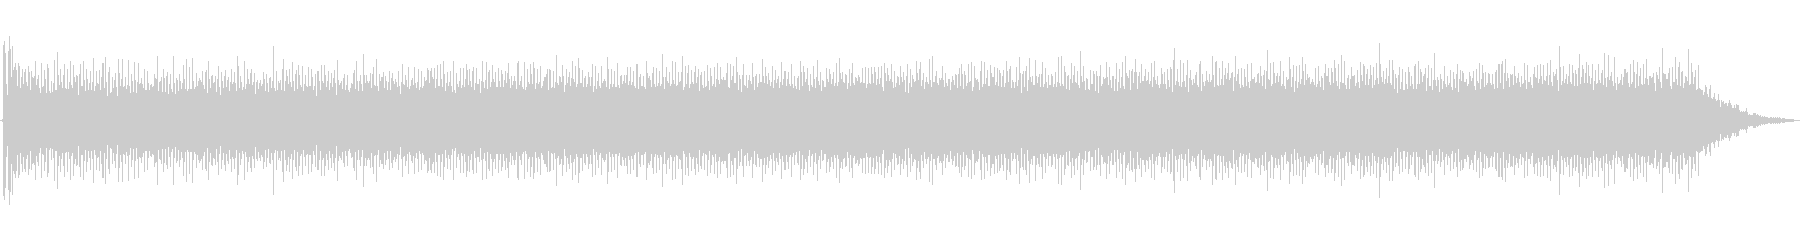 大型金属旋盤:開始、実行、停止の未再生の波形